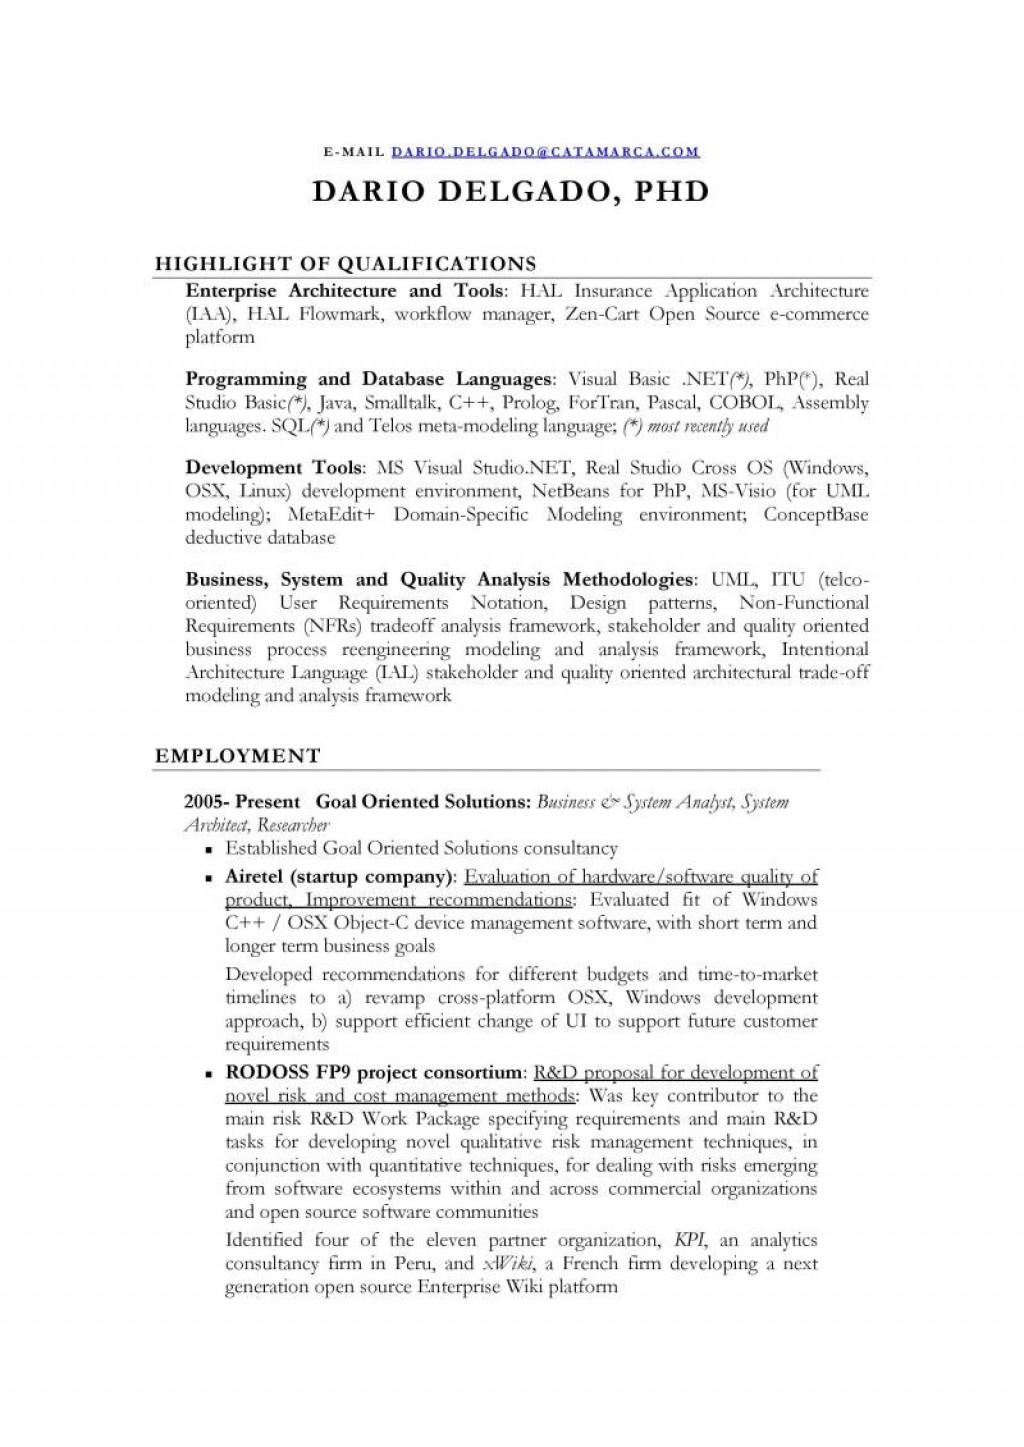 007 Sample Resume Net Developer Unique Essays Apply Texas Professional School Essay Example Of Developerresize8002c1131ssl1 Unusual Examples C 2017 Topic A 2018 College Large